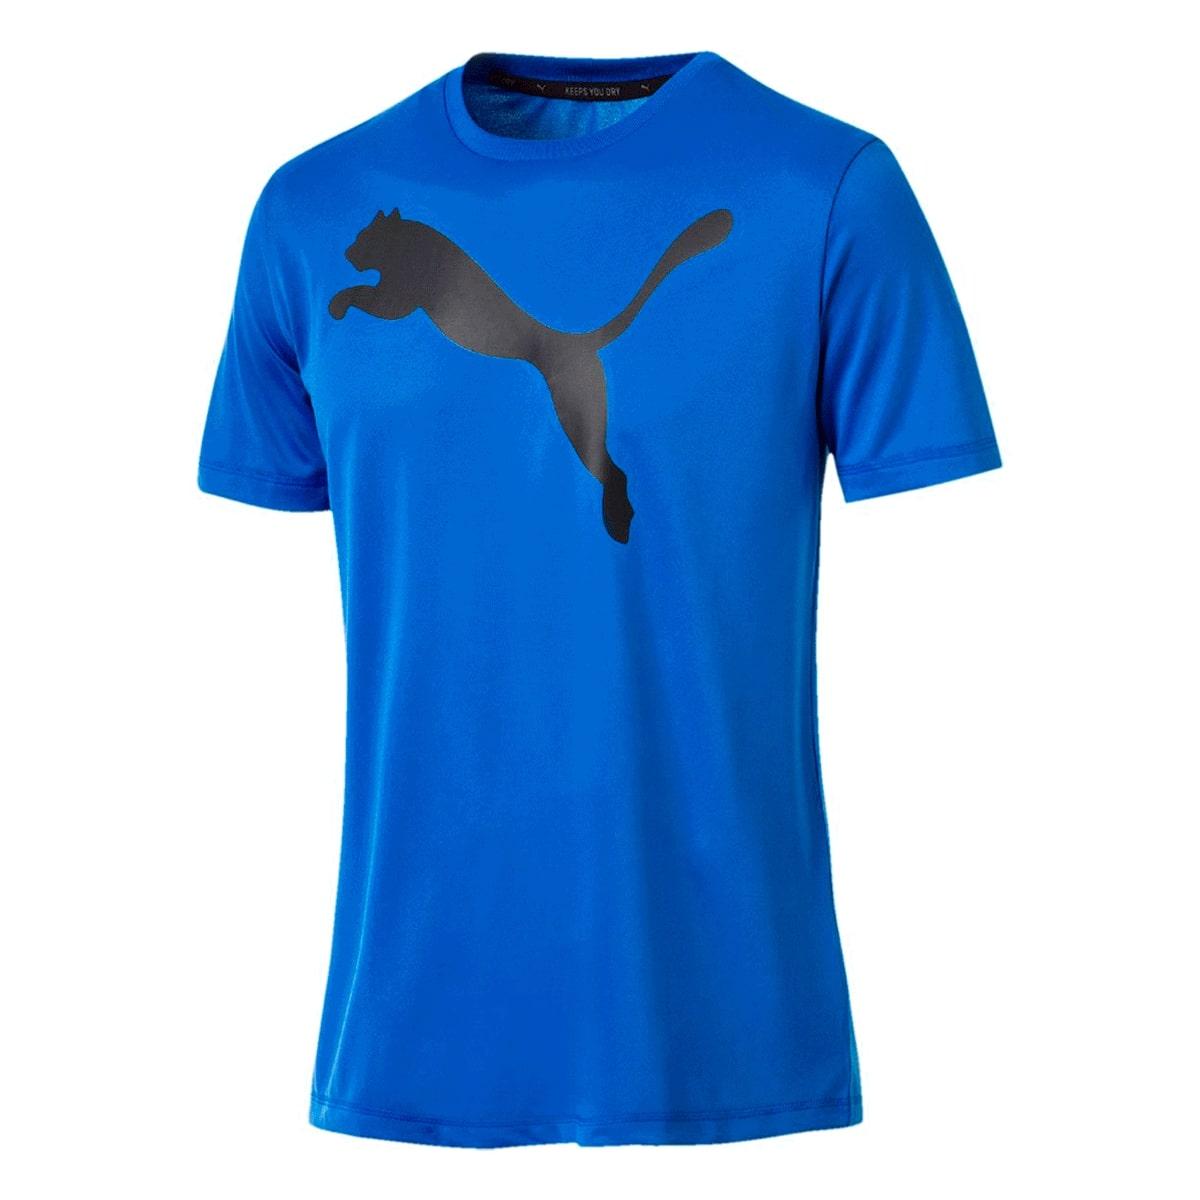 Camiseta Puma Active Masculino Azul Royal